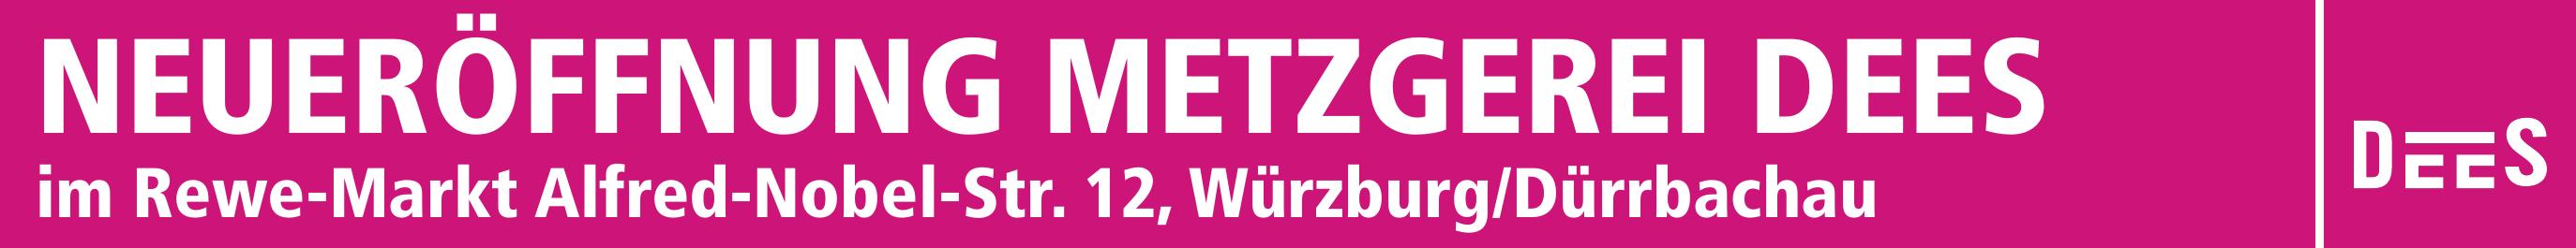 Neueröffnung Metzgerei Dees Image 1